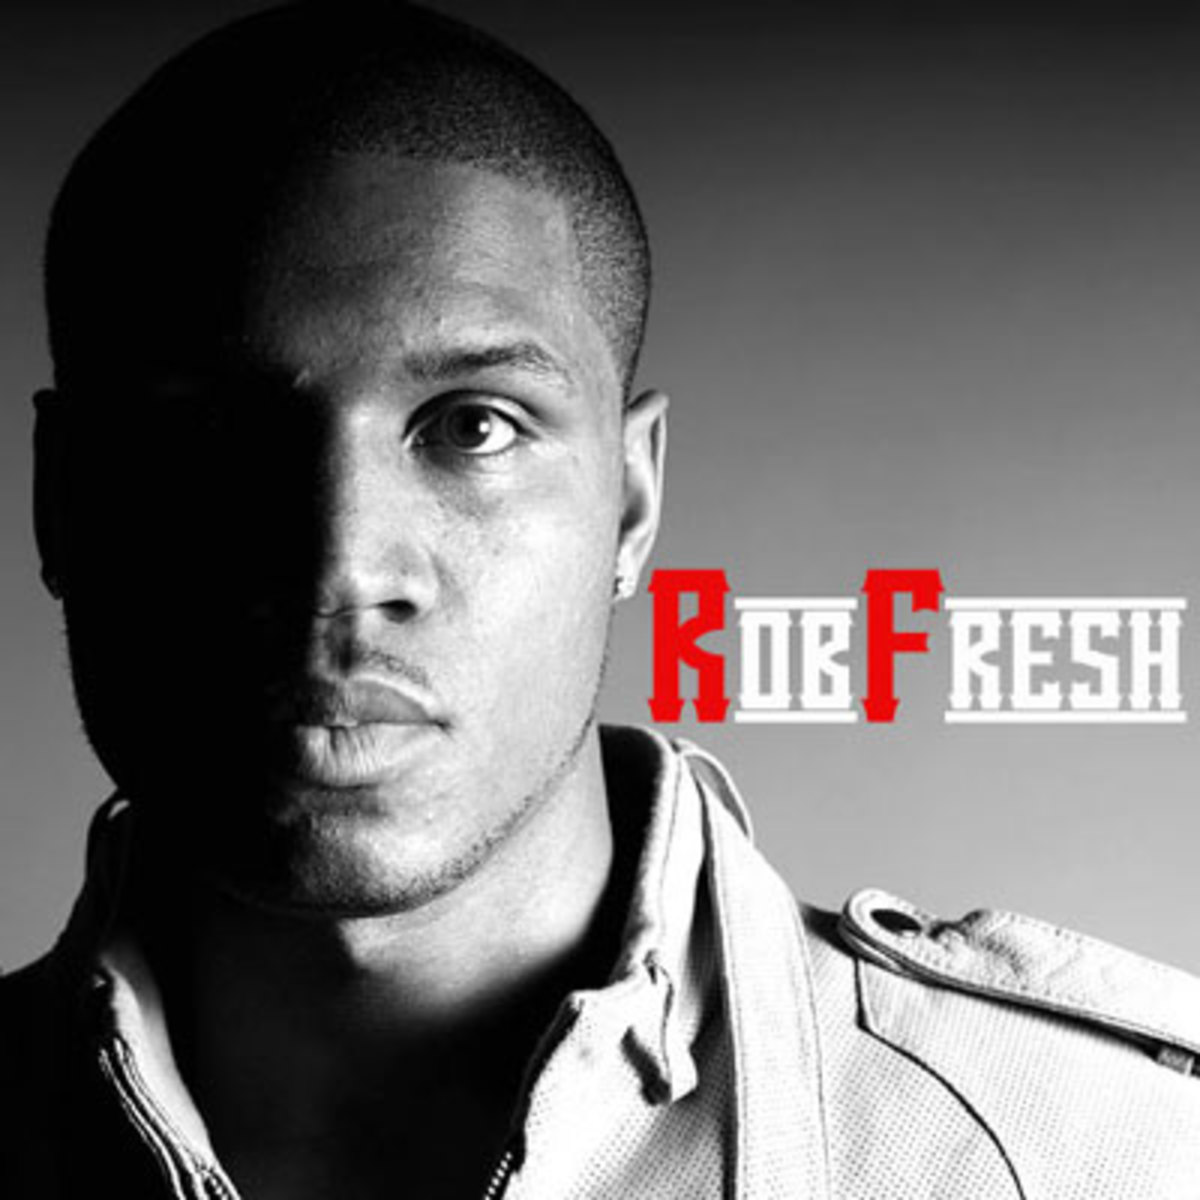 rob-fresh.jpg